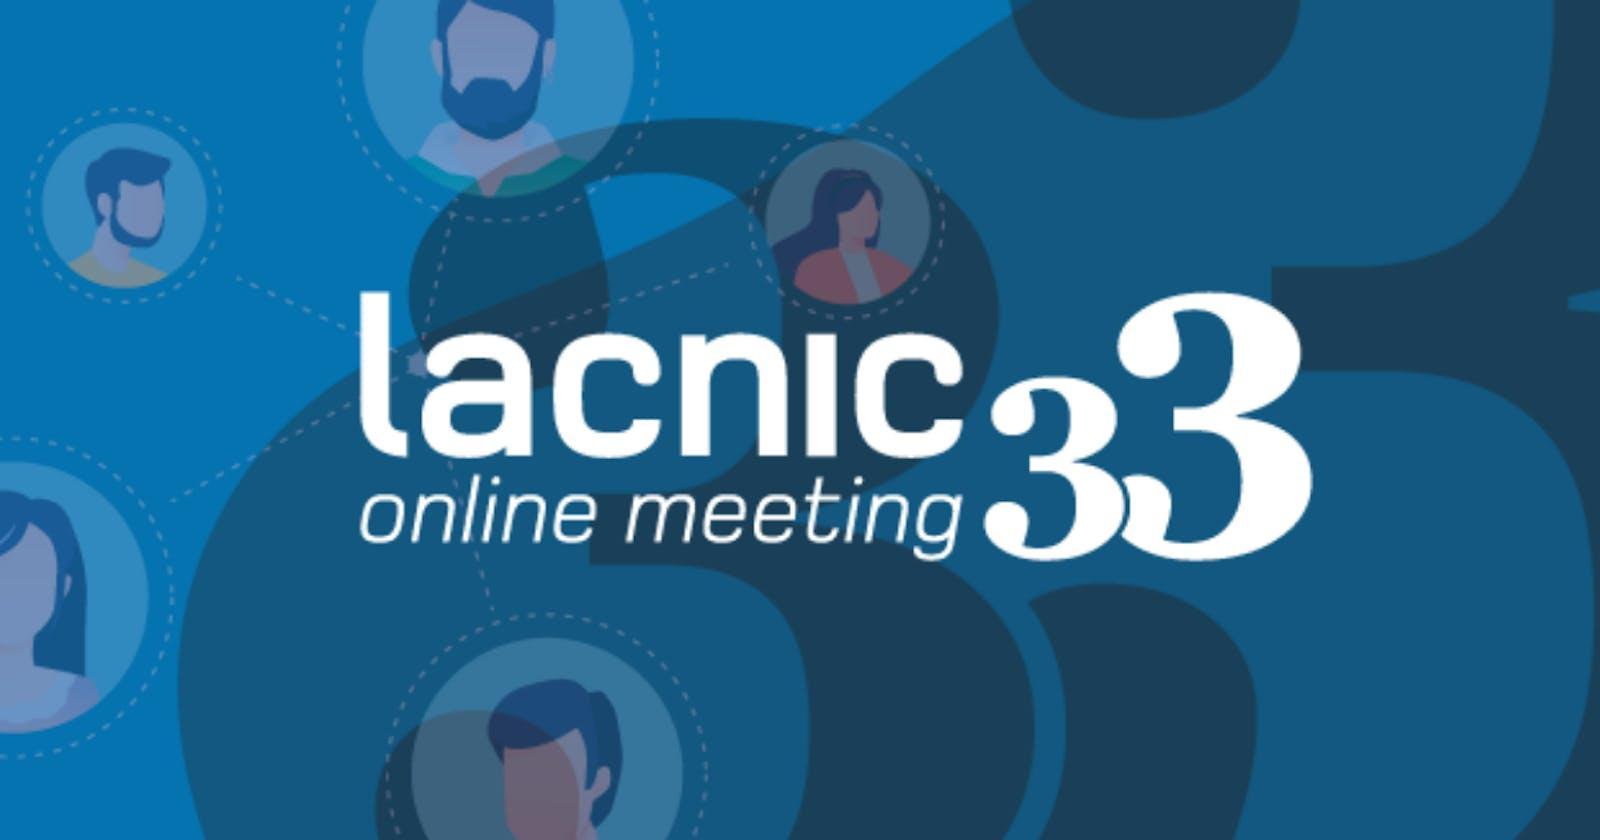 LACNIC 33 - TL;DR